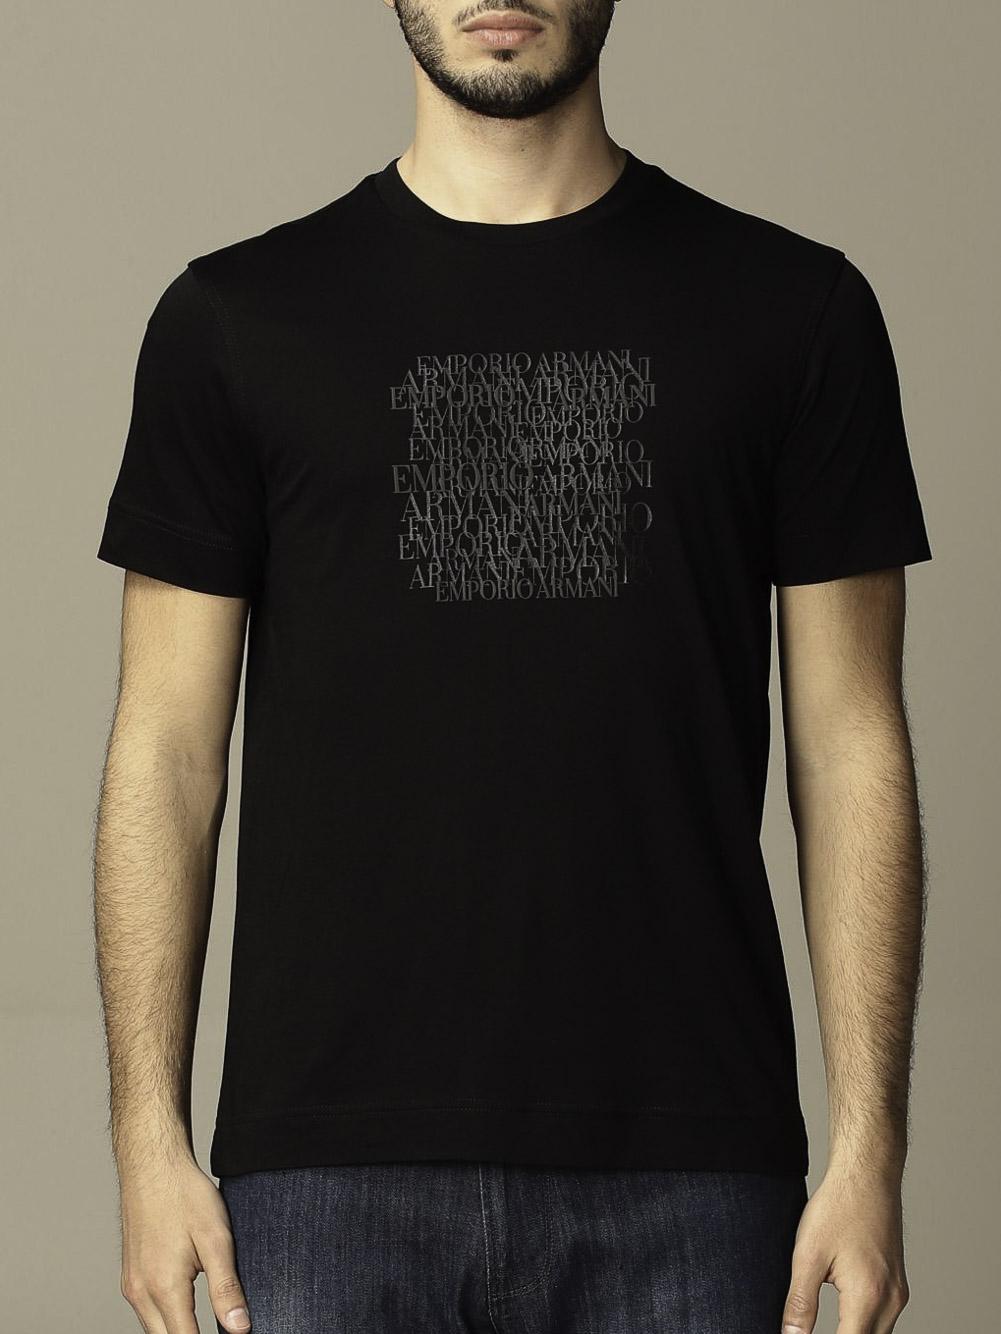 EMPORIO ARMANI Μπλούζα t-shirt 3K1TD61JSHZ-0999 ΜΑΥΡΟ